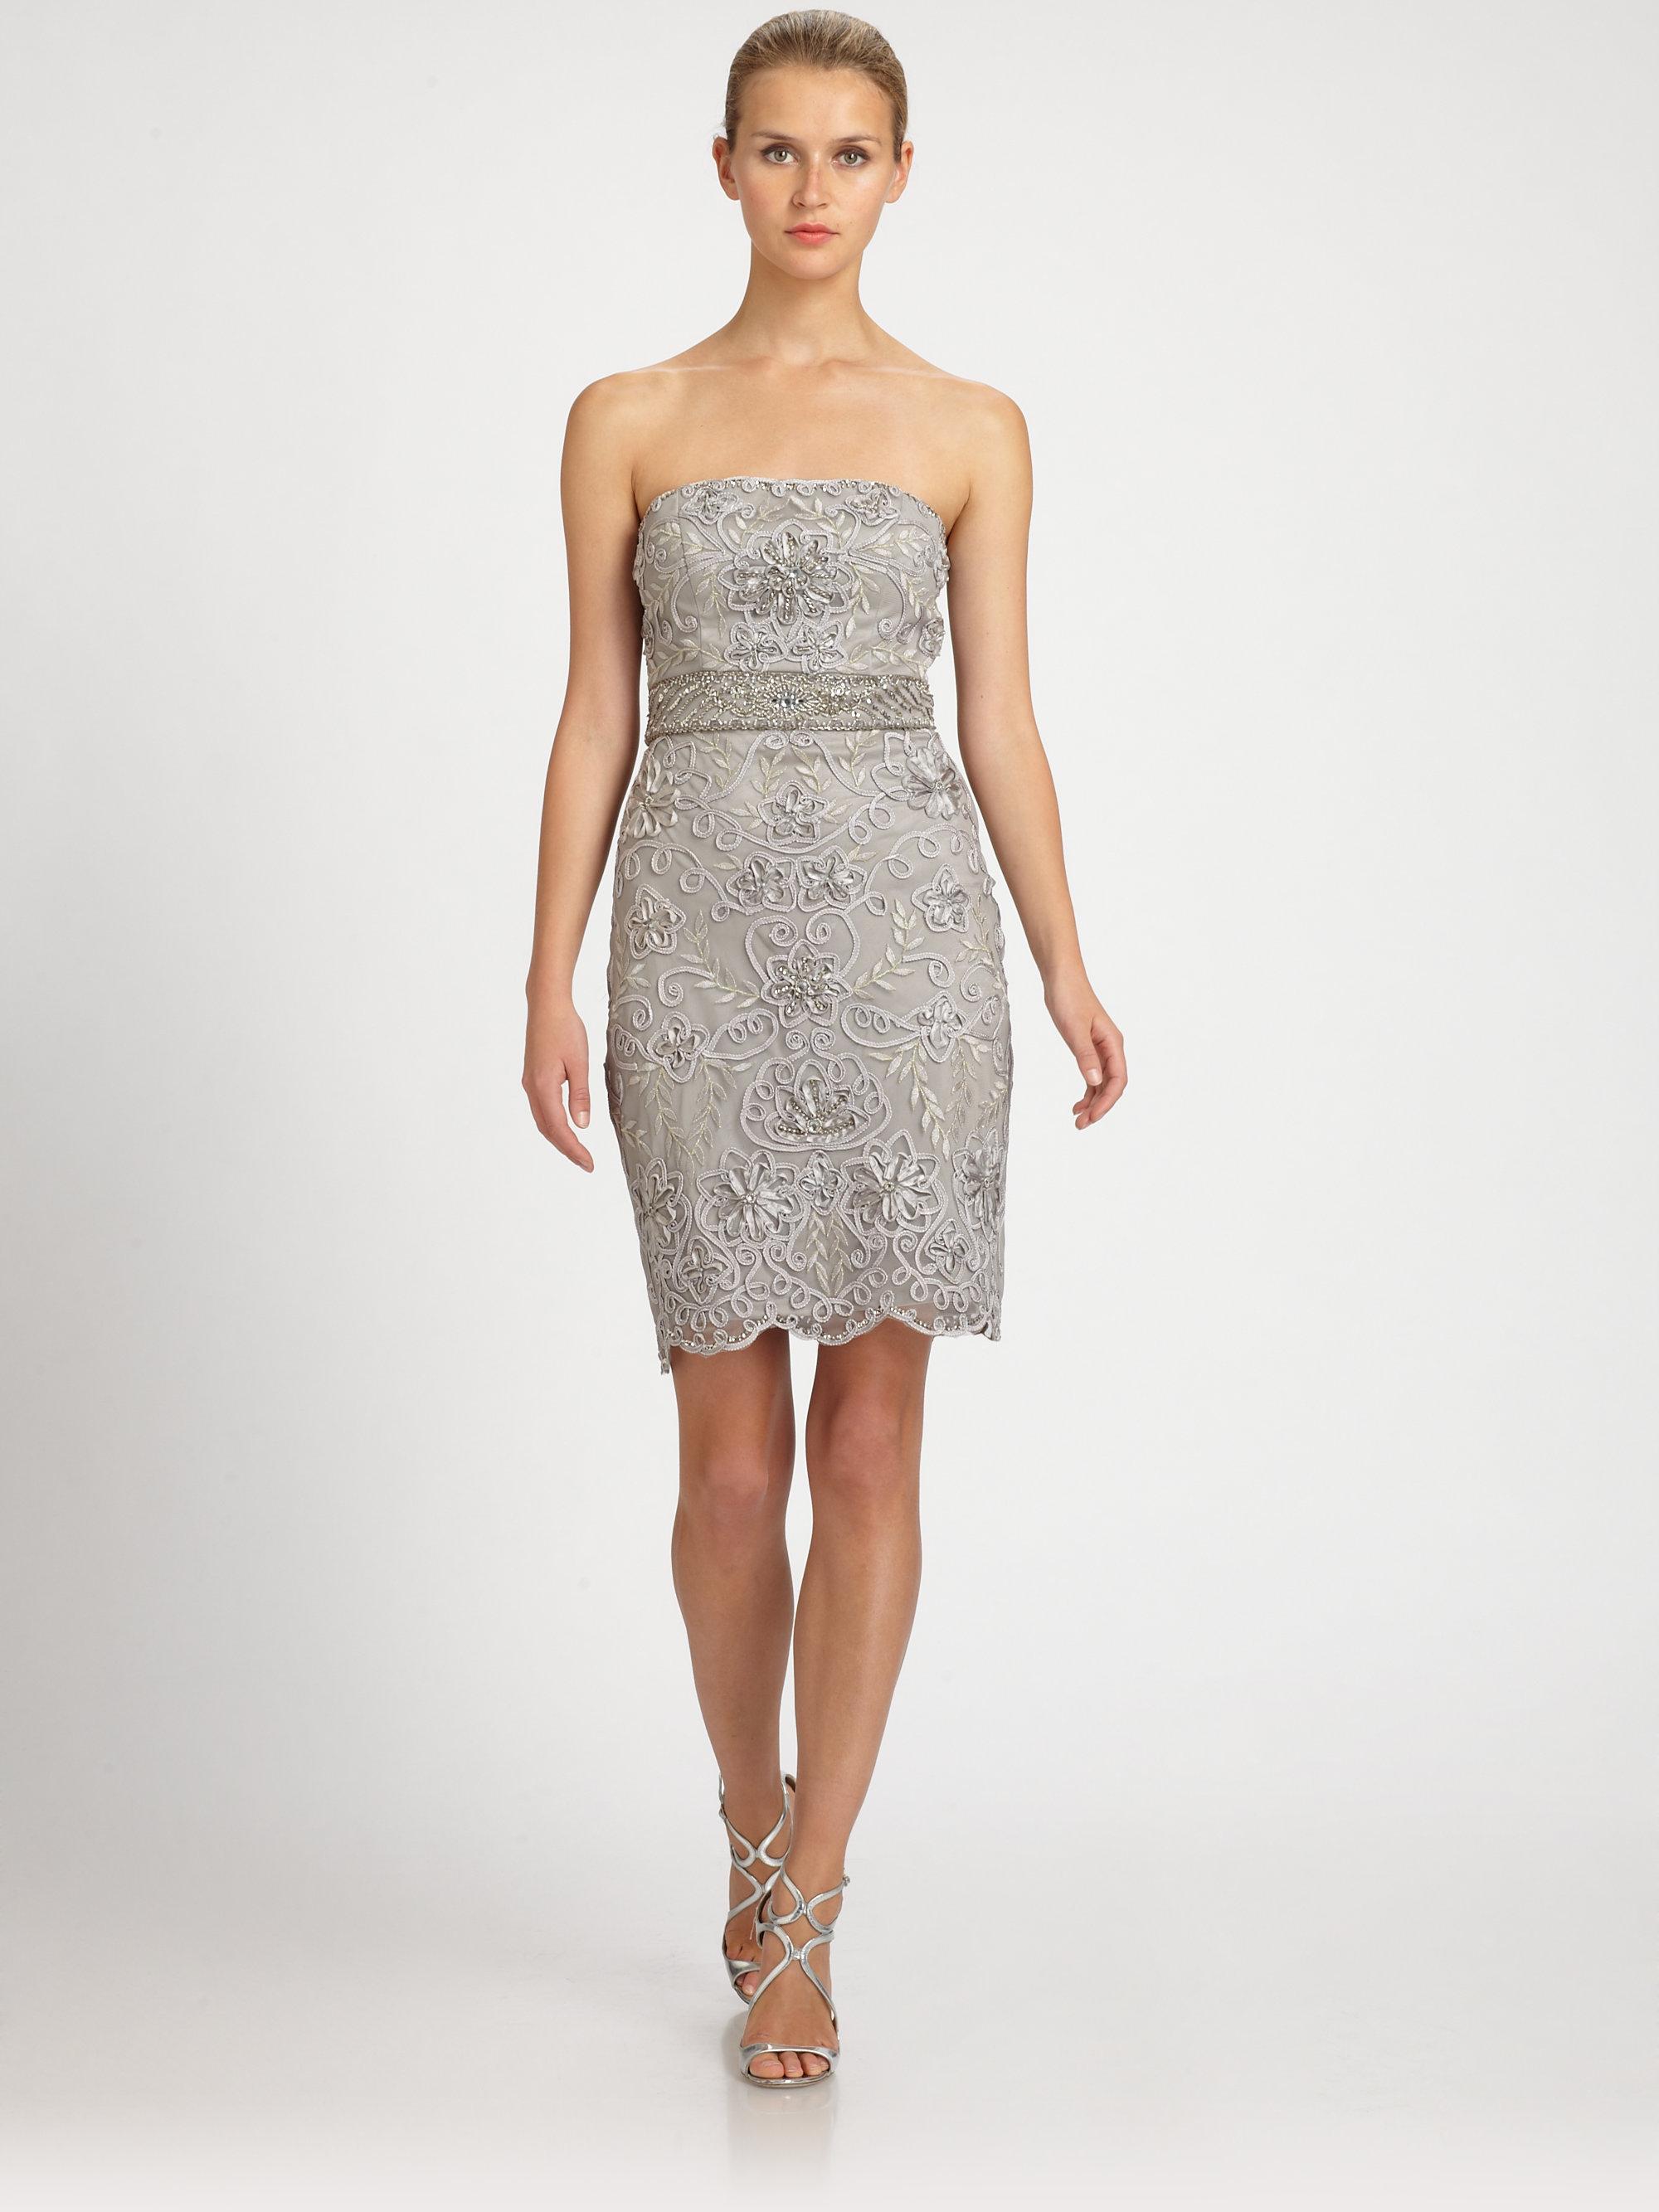 Sue wong Beaded Strapless Dress in Metallic - Lyst